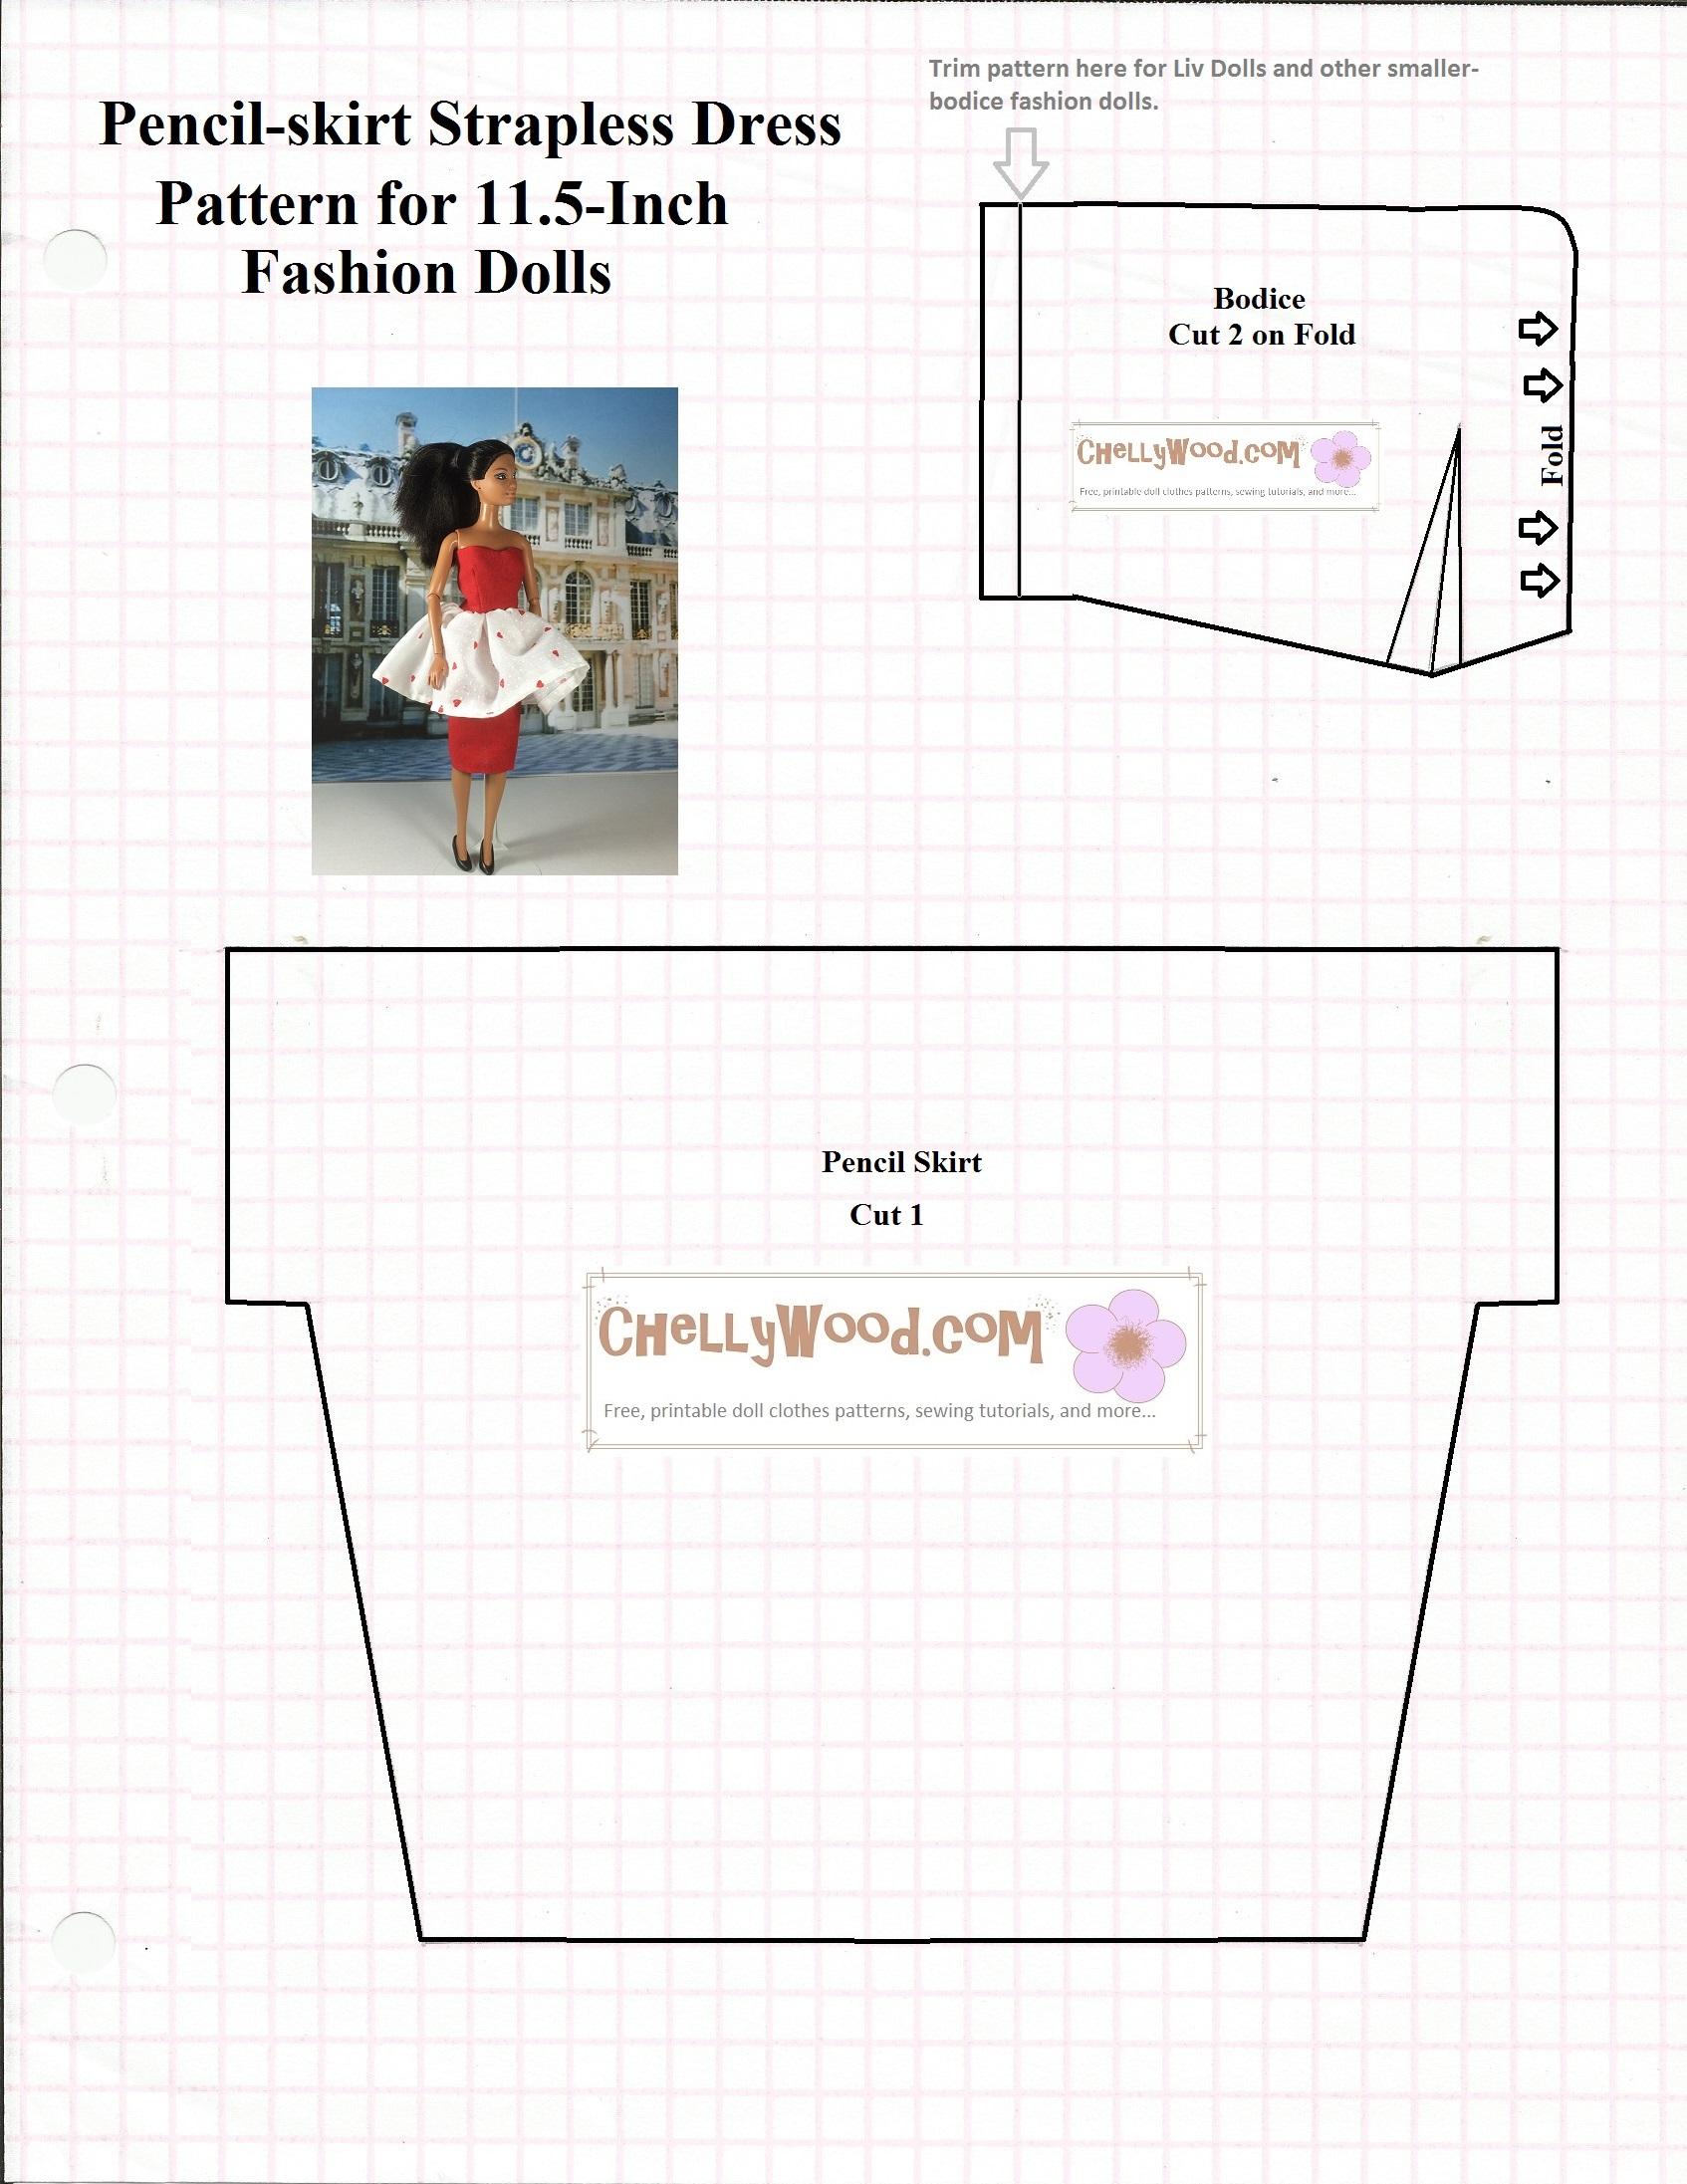 dress pattern for fashion dolls